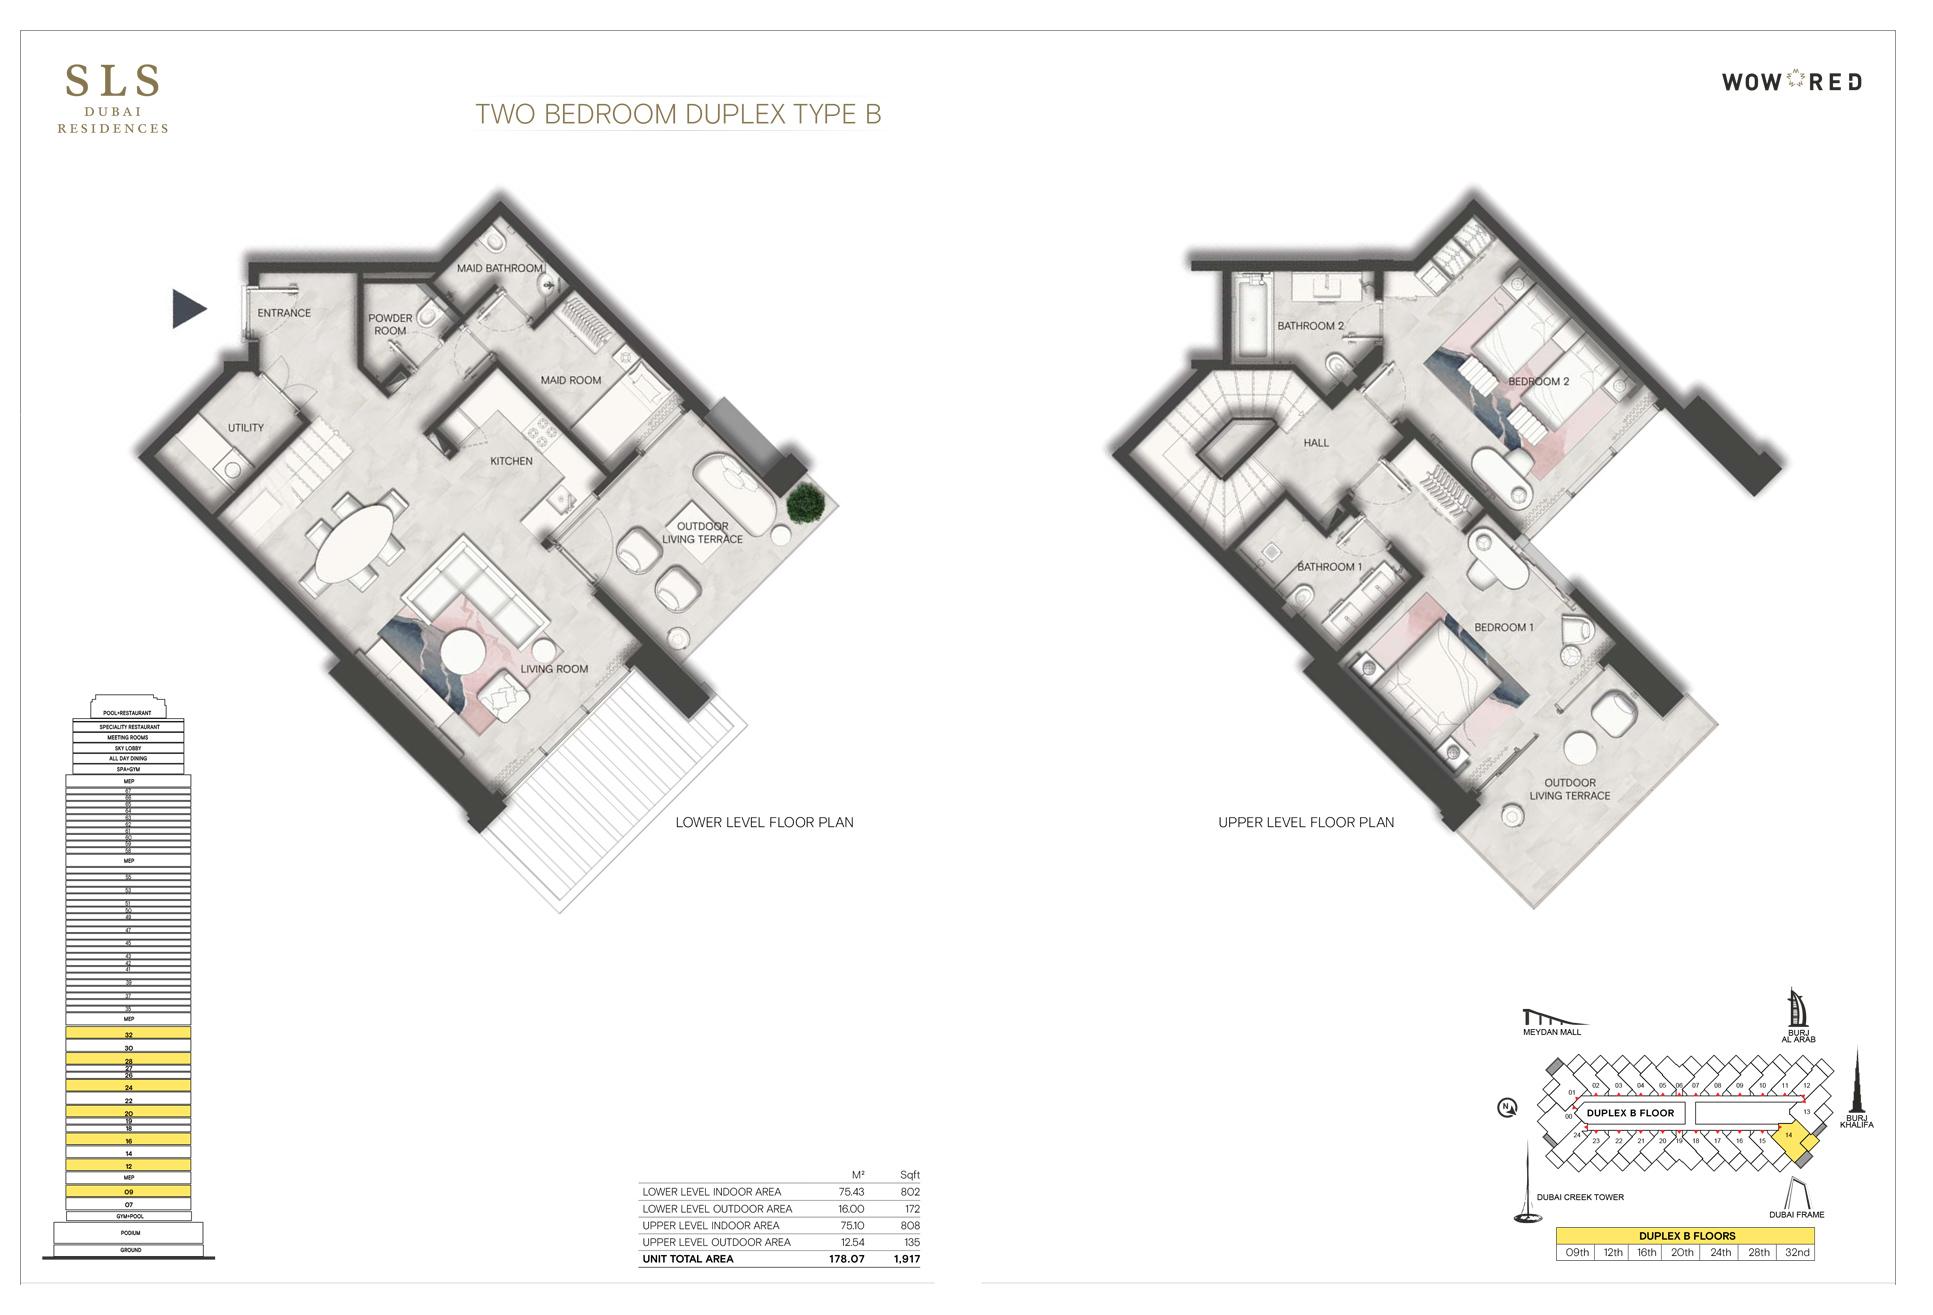 2 Bedroom Duplex Type B Size 1917 sq.ft